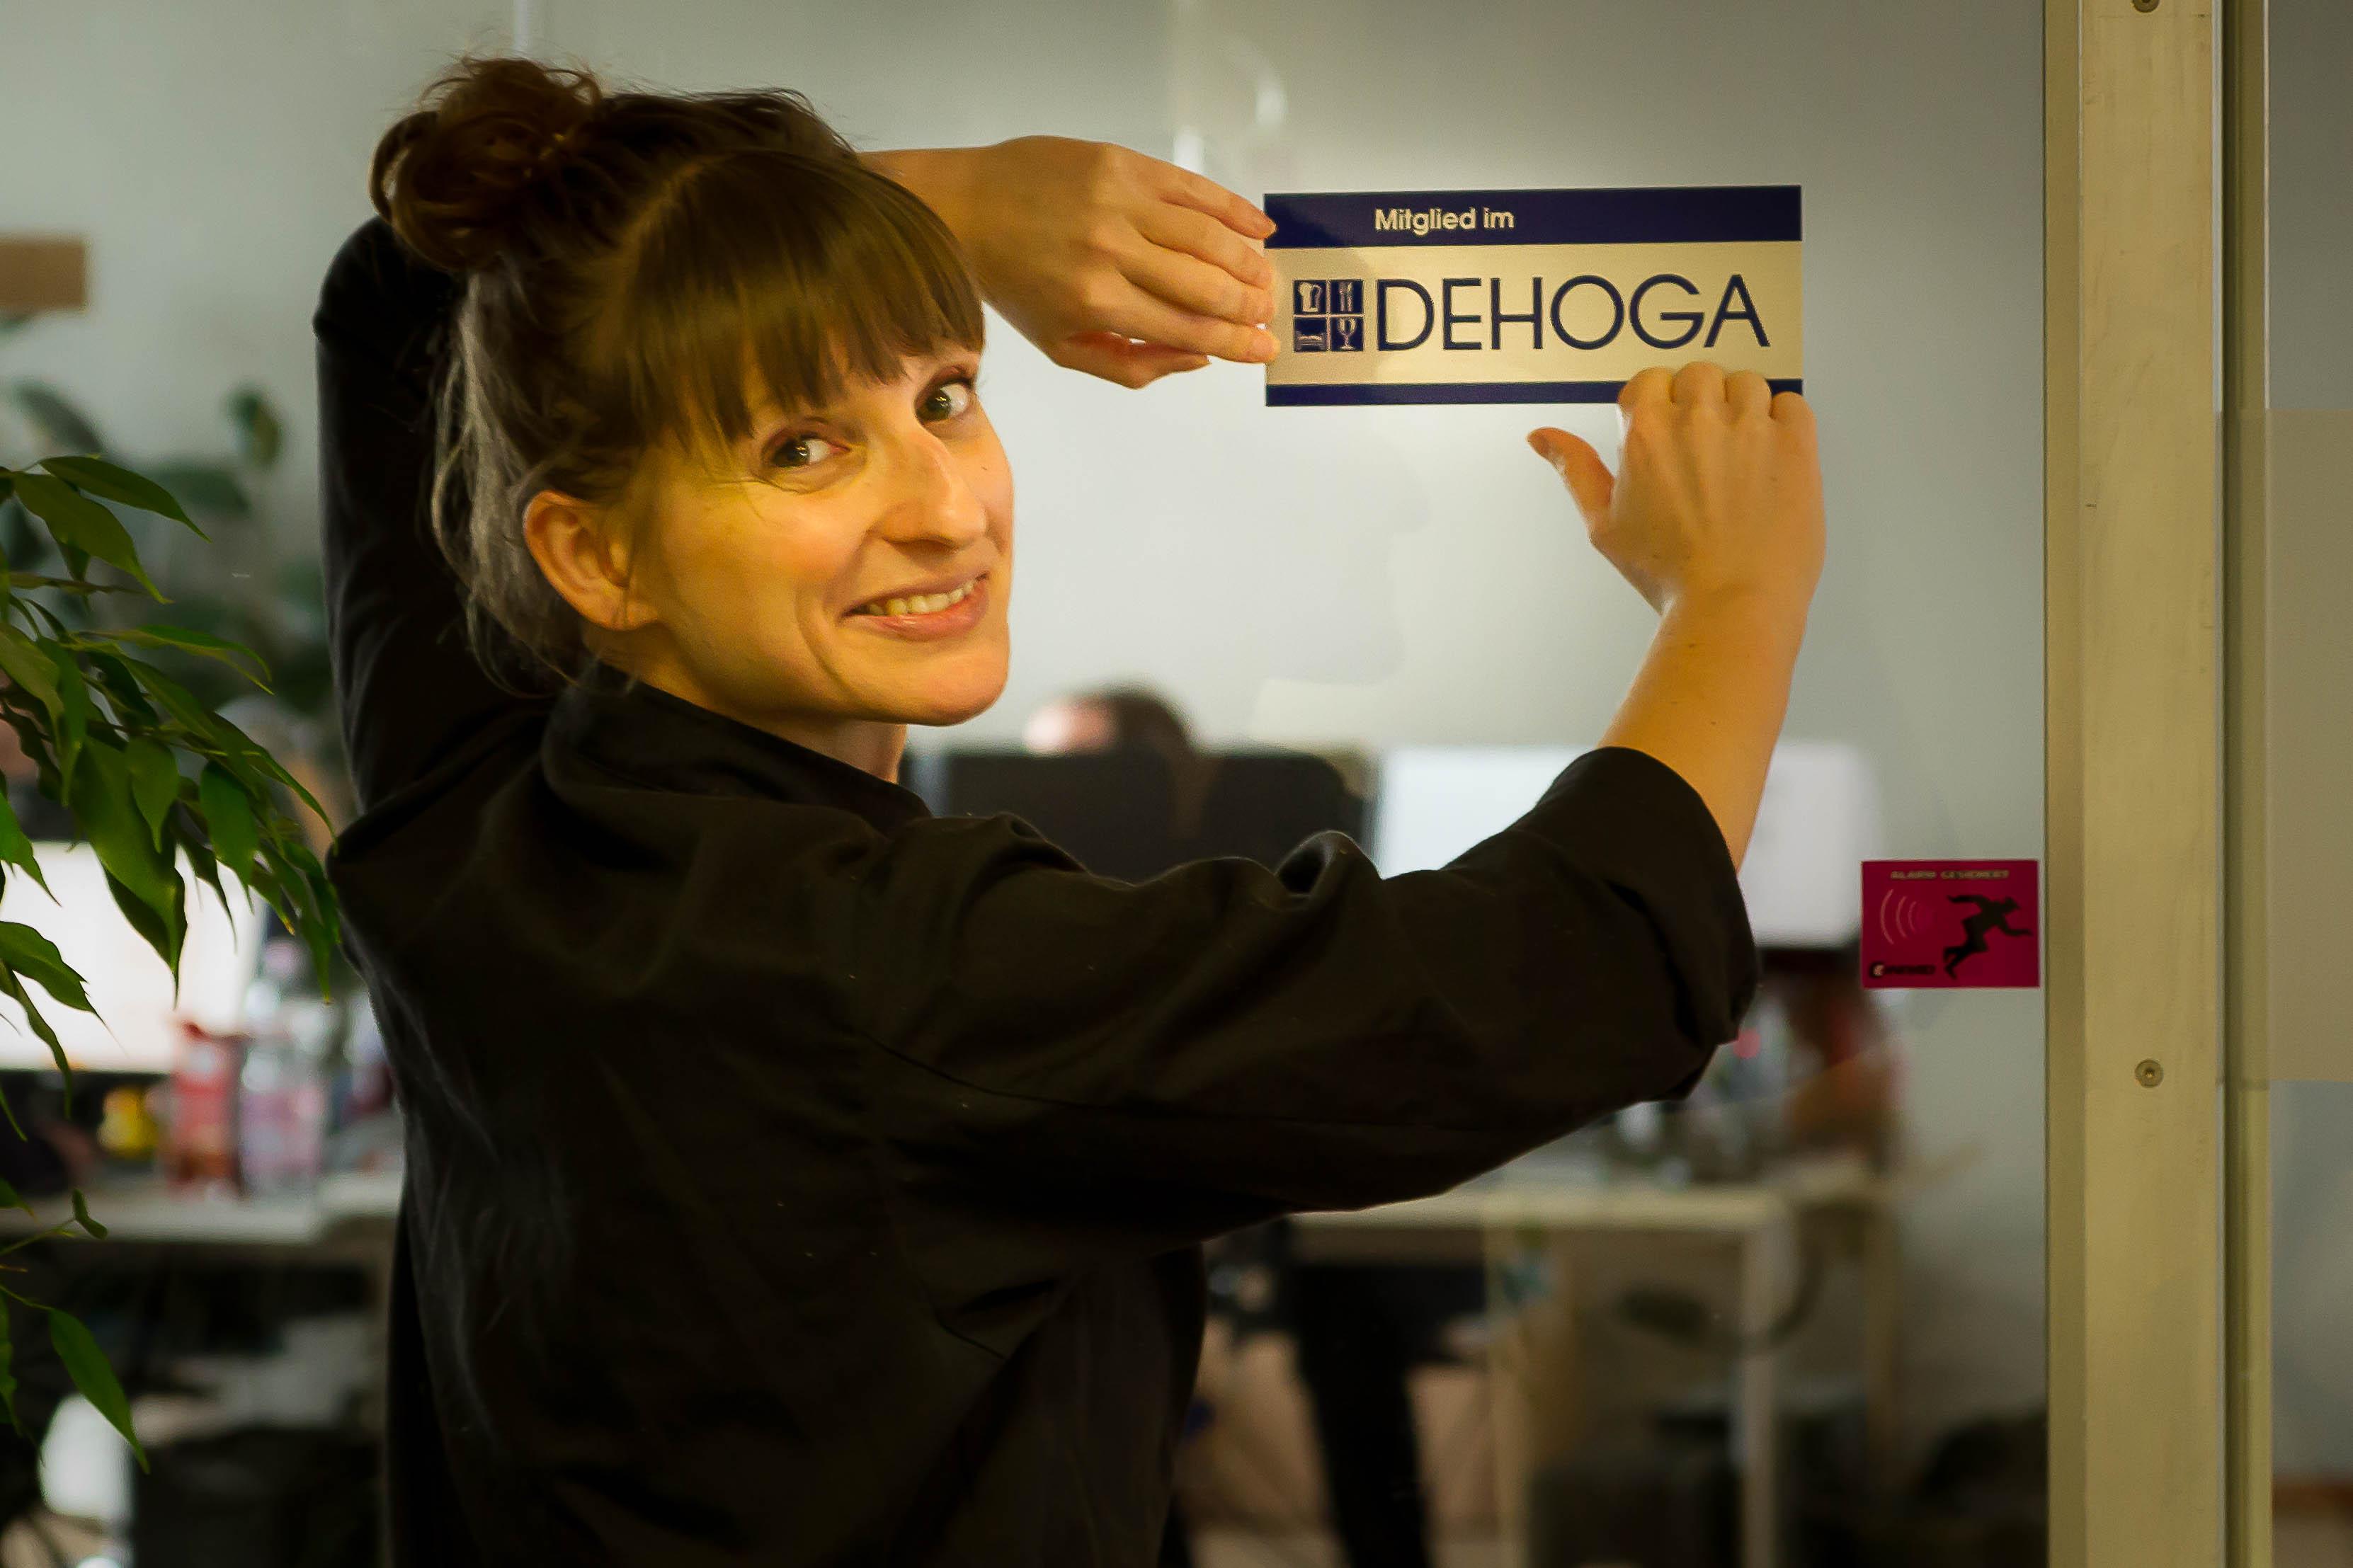 DEHOGA Catering